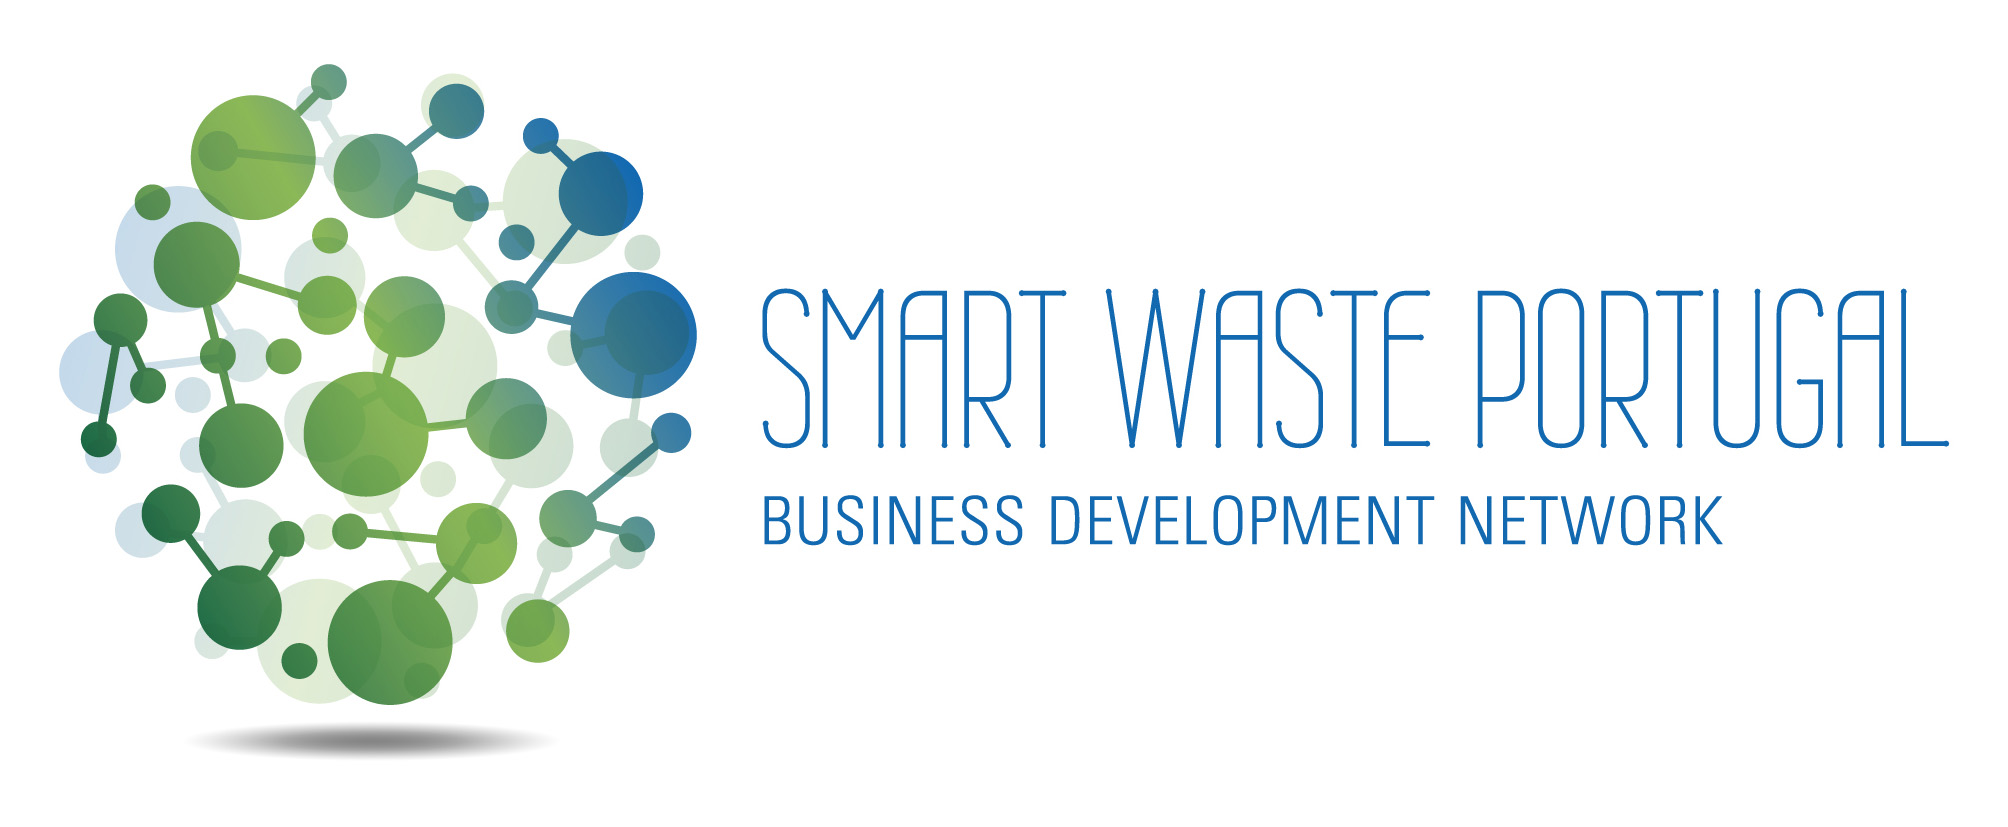 https://europeanplasticspact.org/wp-content/uploads/2020/03/Smart-Waste-Portugal.jpg